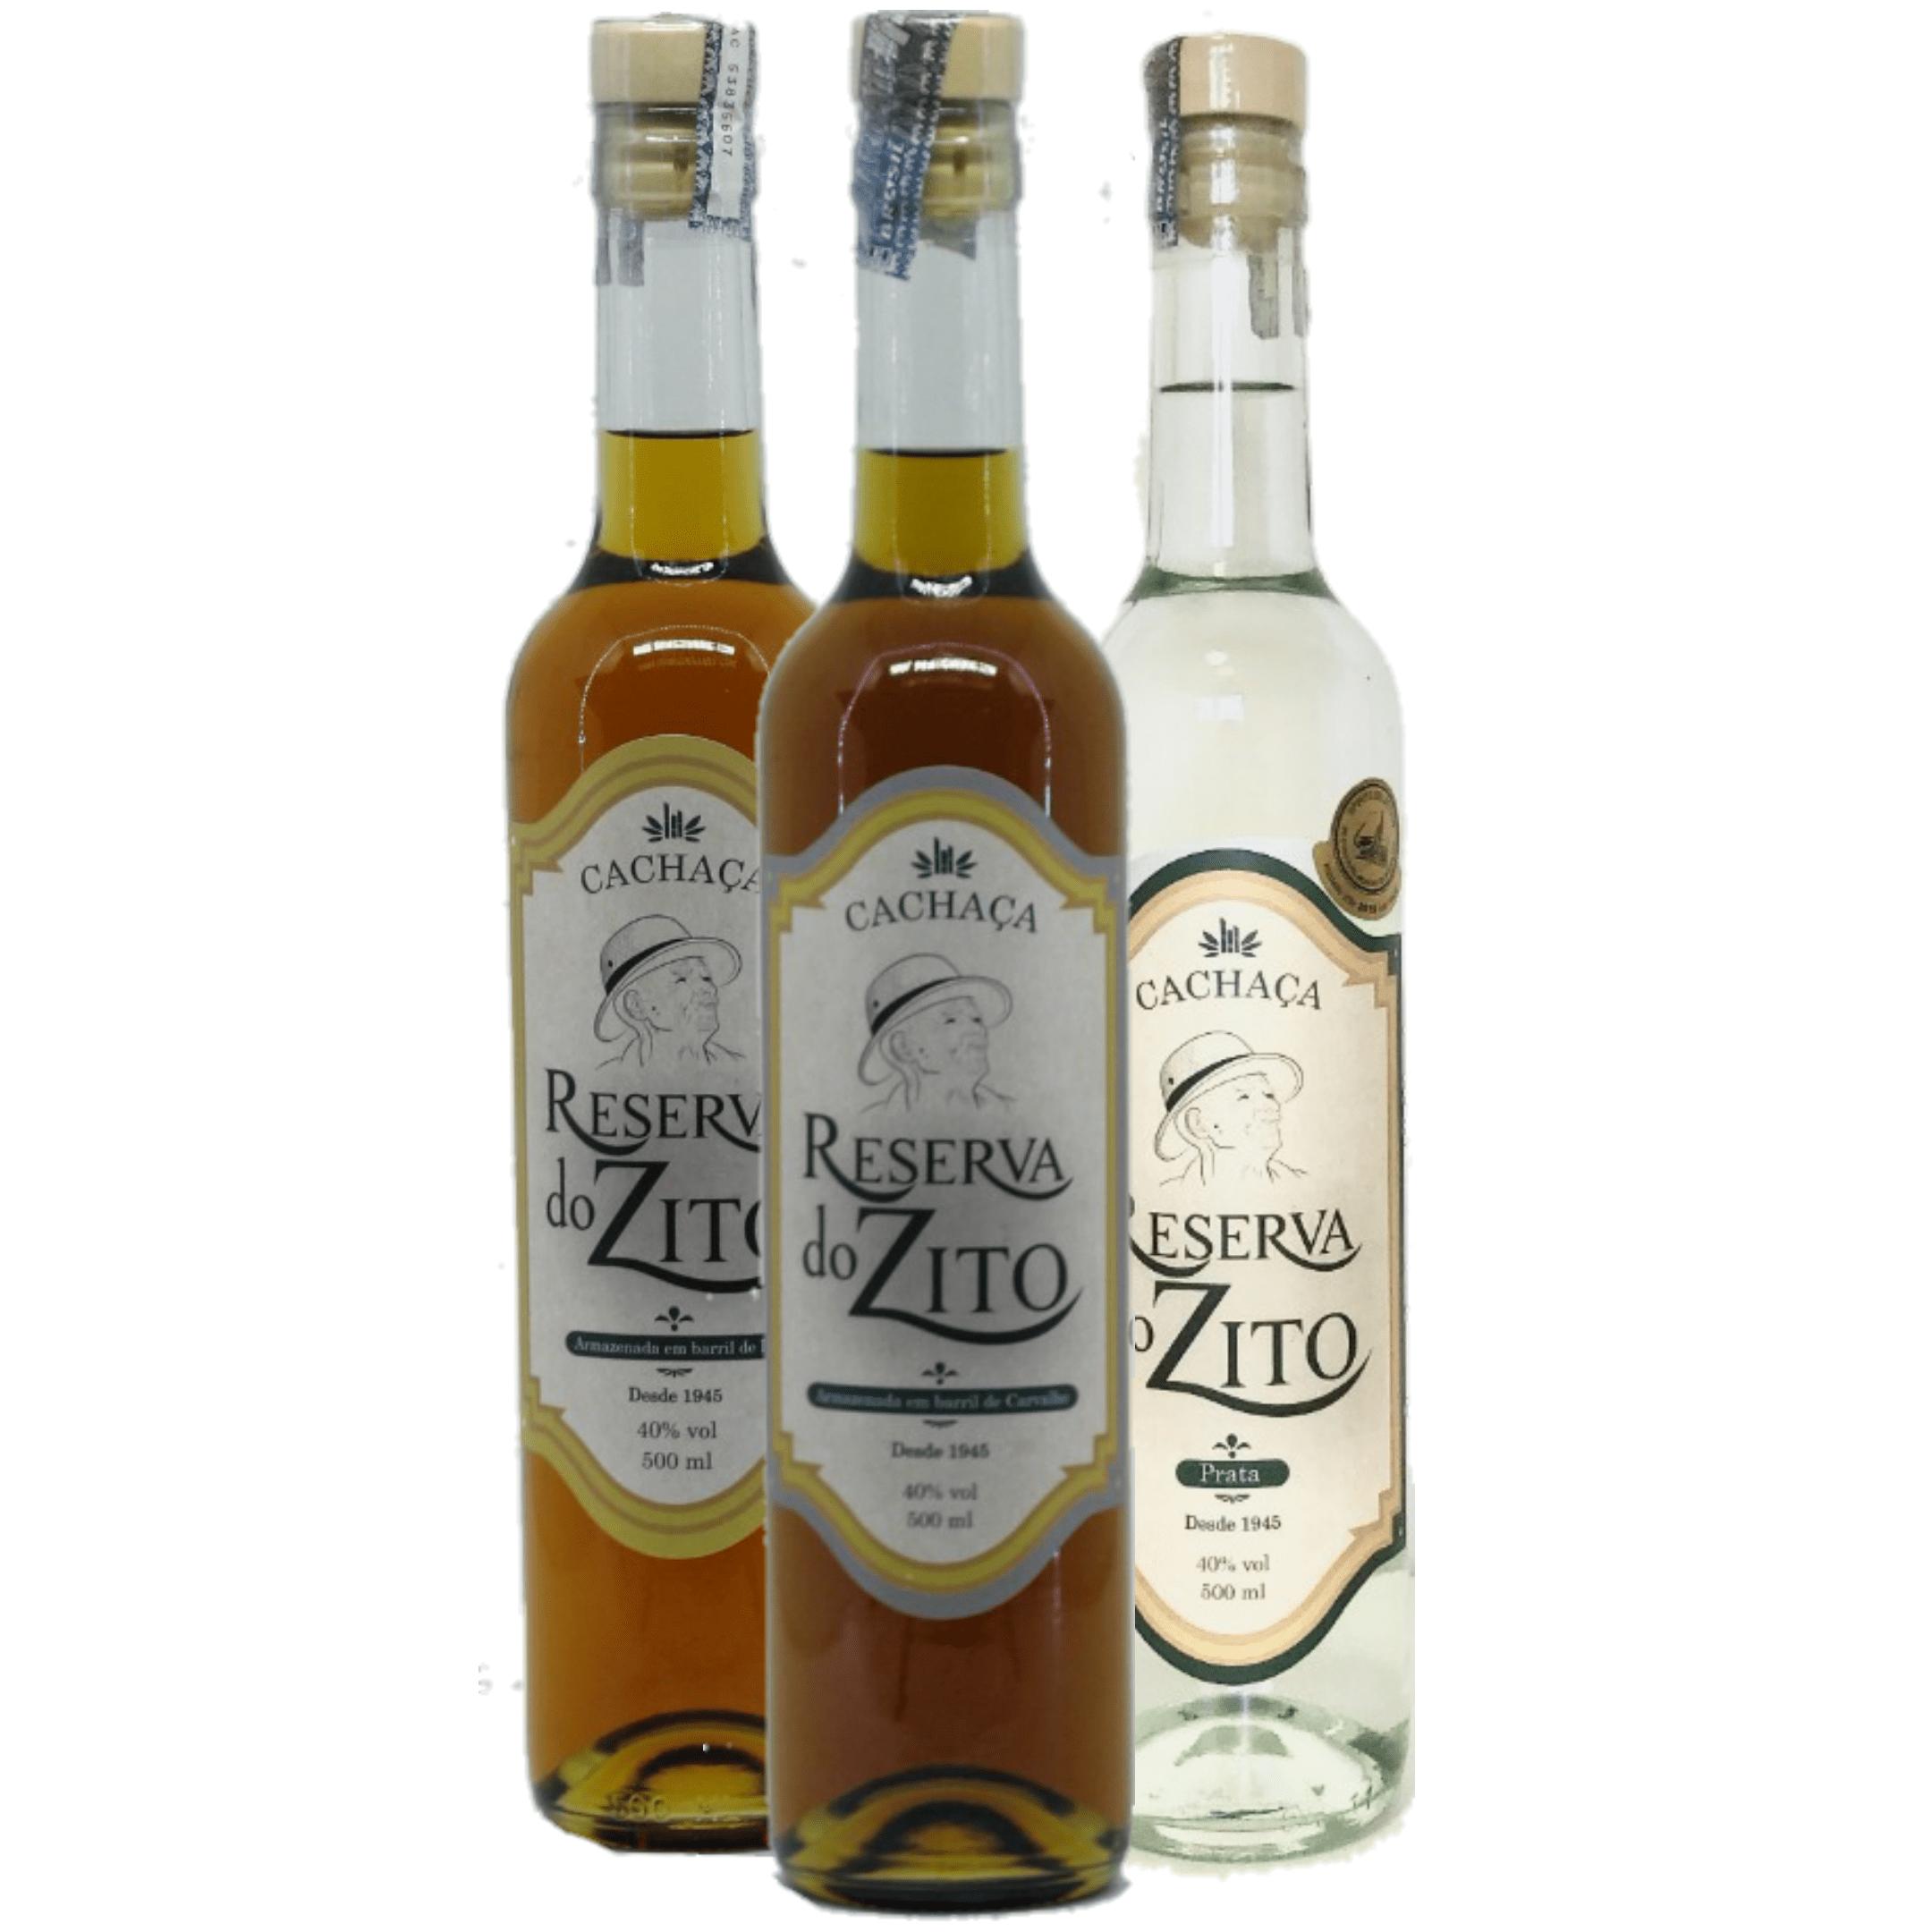 Kit Cachaça Reserva do Zito - Prata/Ipê e Carvalho - 500 ml